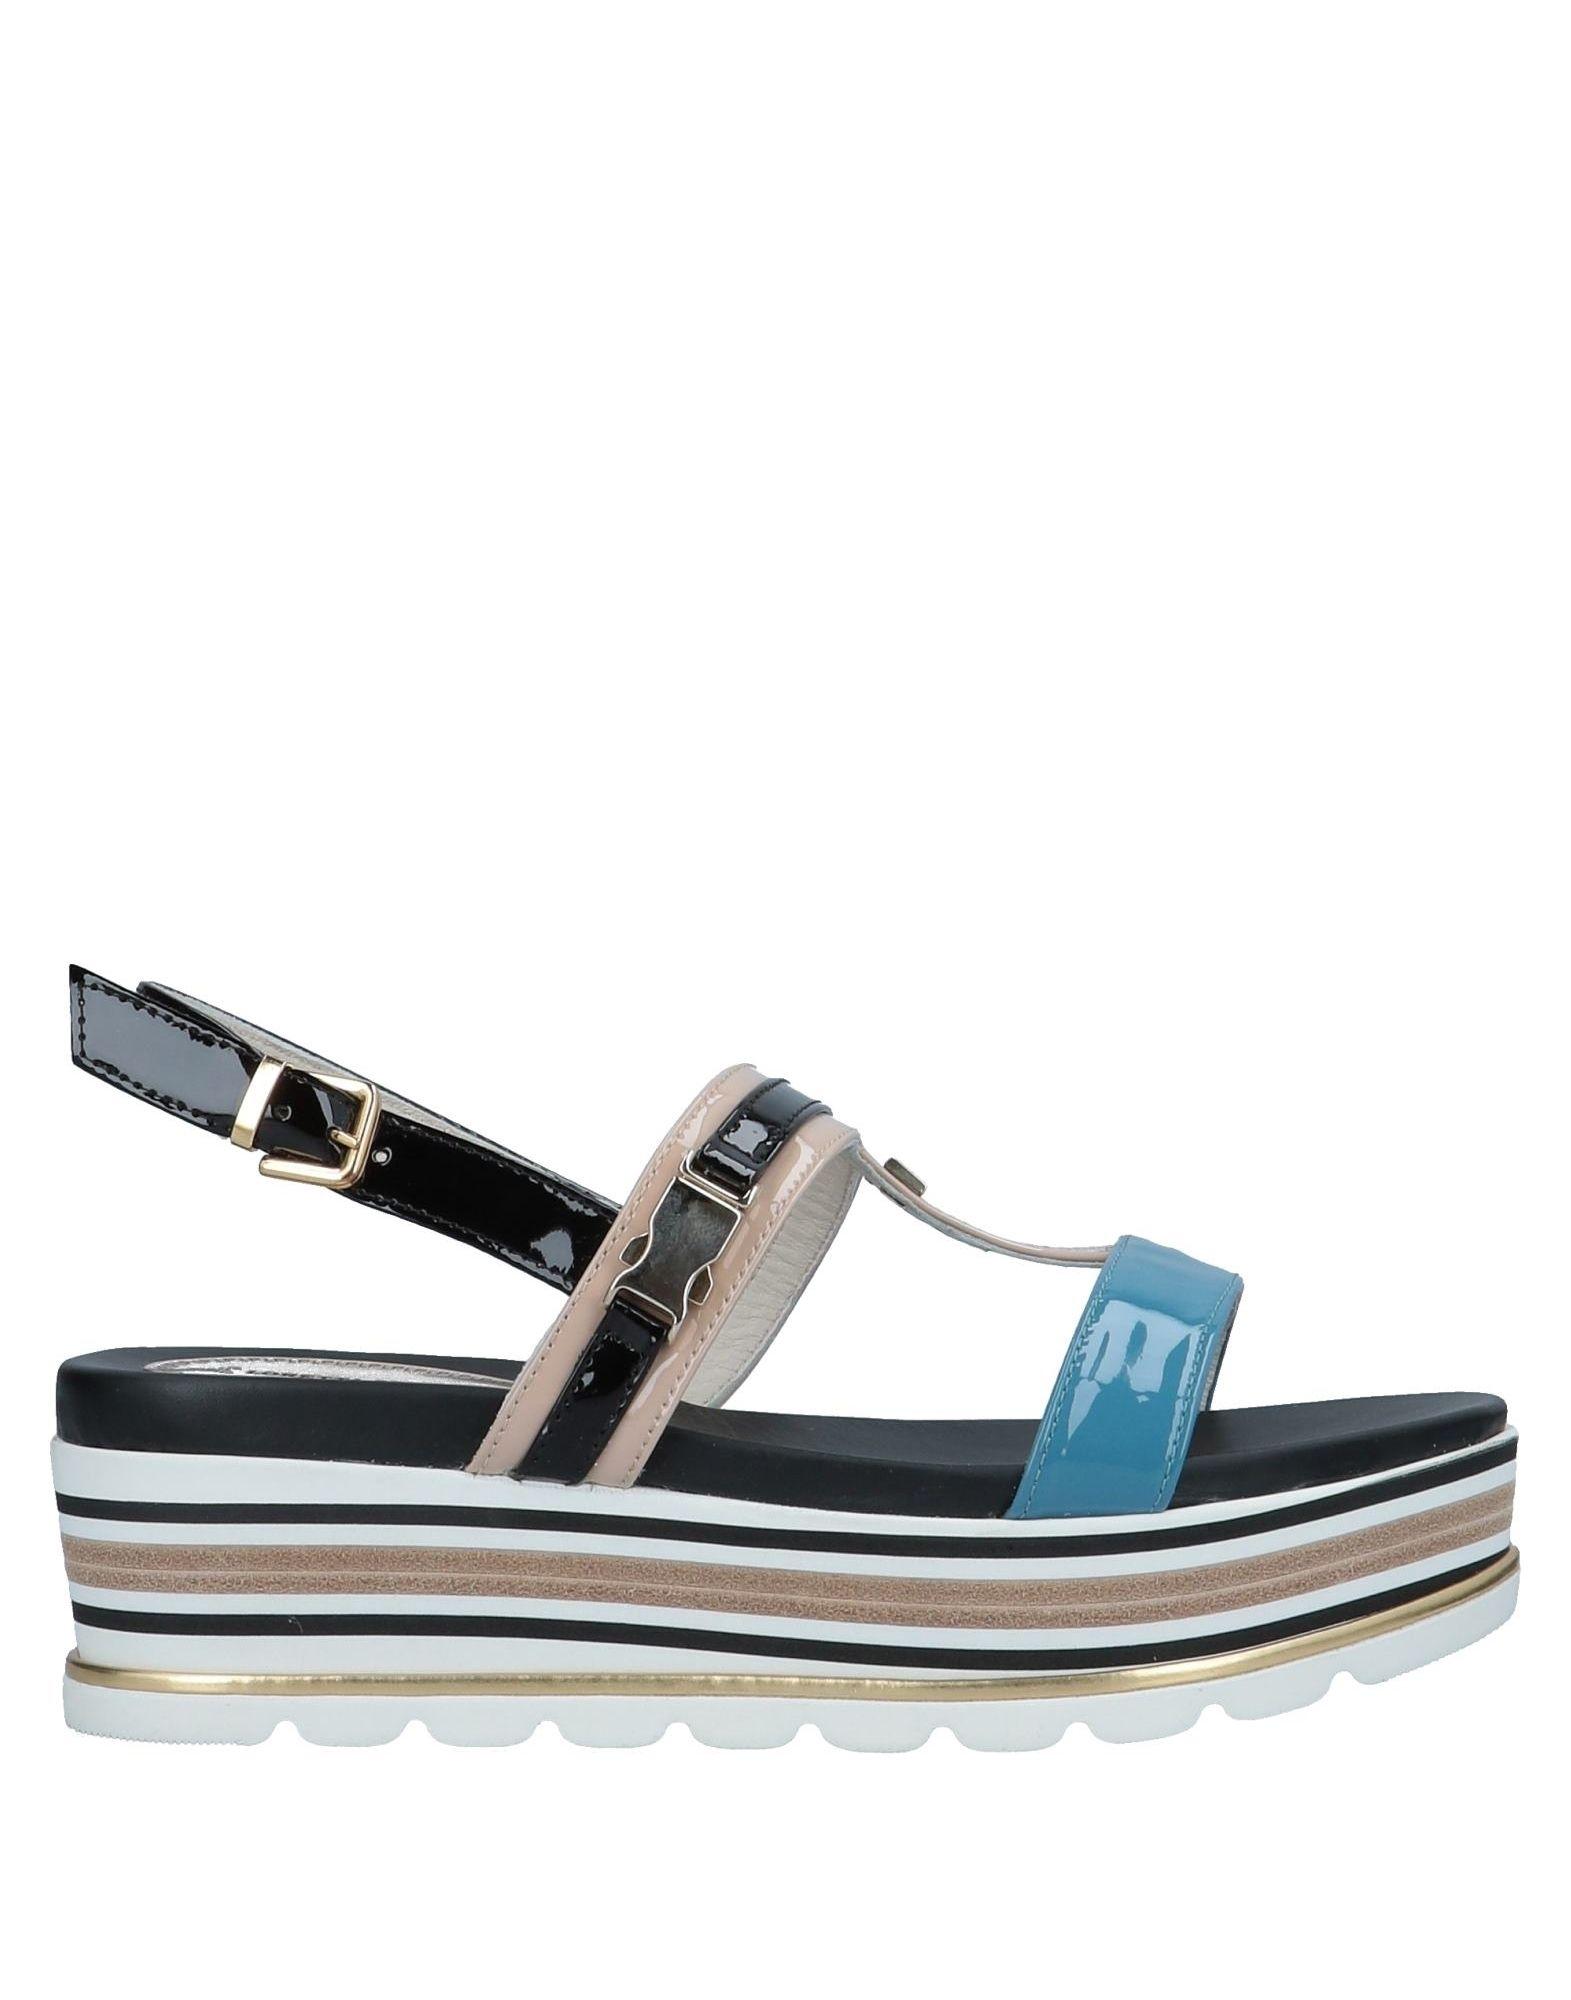 Loretta Pettinari Sandalen Damen beliebte  11550100SI Gute Qualität beliebte Damen Schuhe 44c2cd